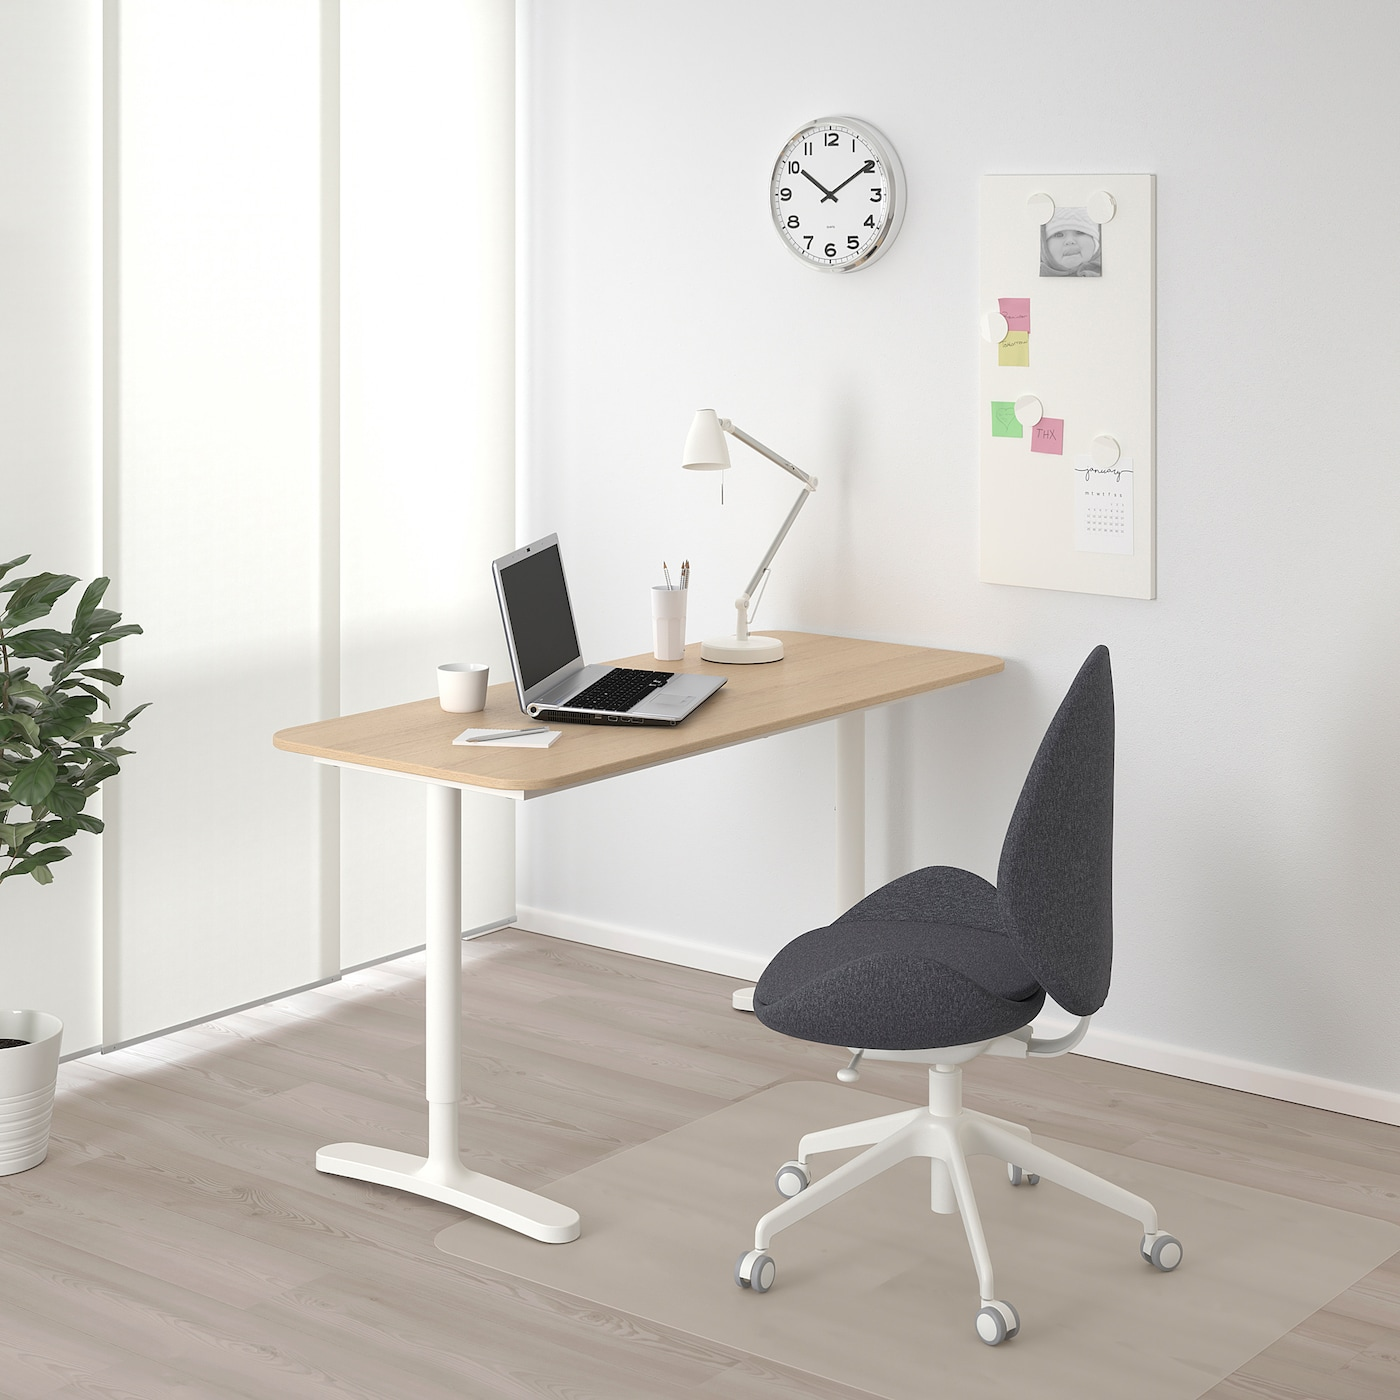 BEKANT مكتب, قشرة سنديان مصبوغ أبيض/أبيض, 140x60 سم